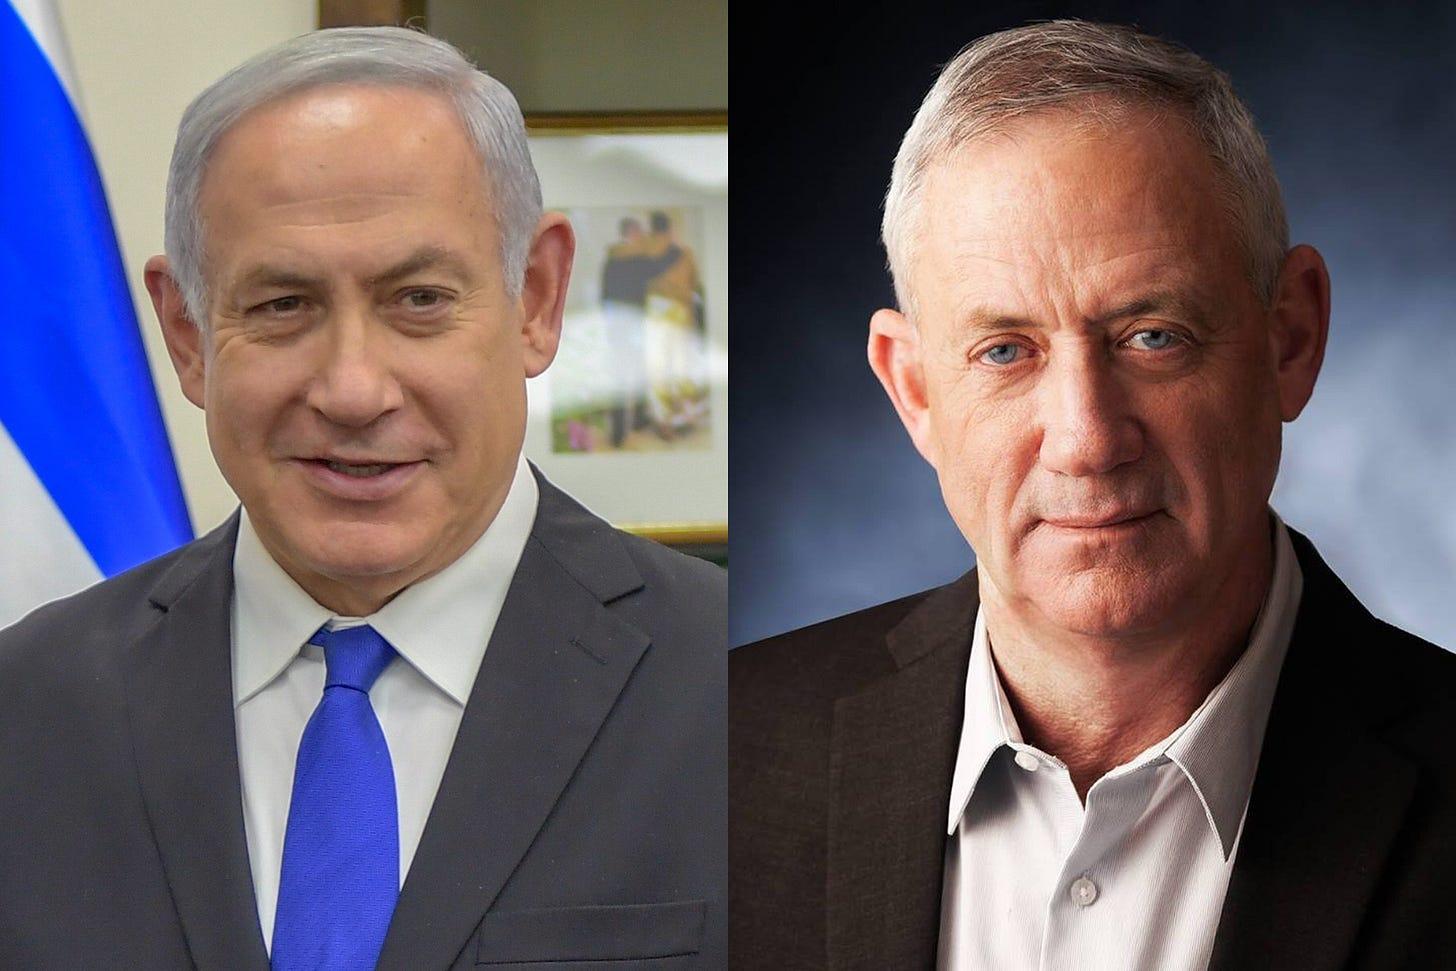 File:Benjamin Netanyahu and Benny Gantz montage.jpg - Wikimedia Commons